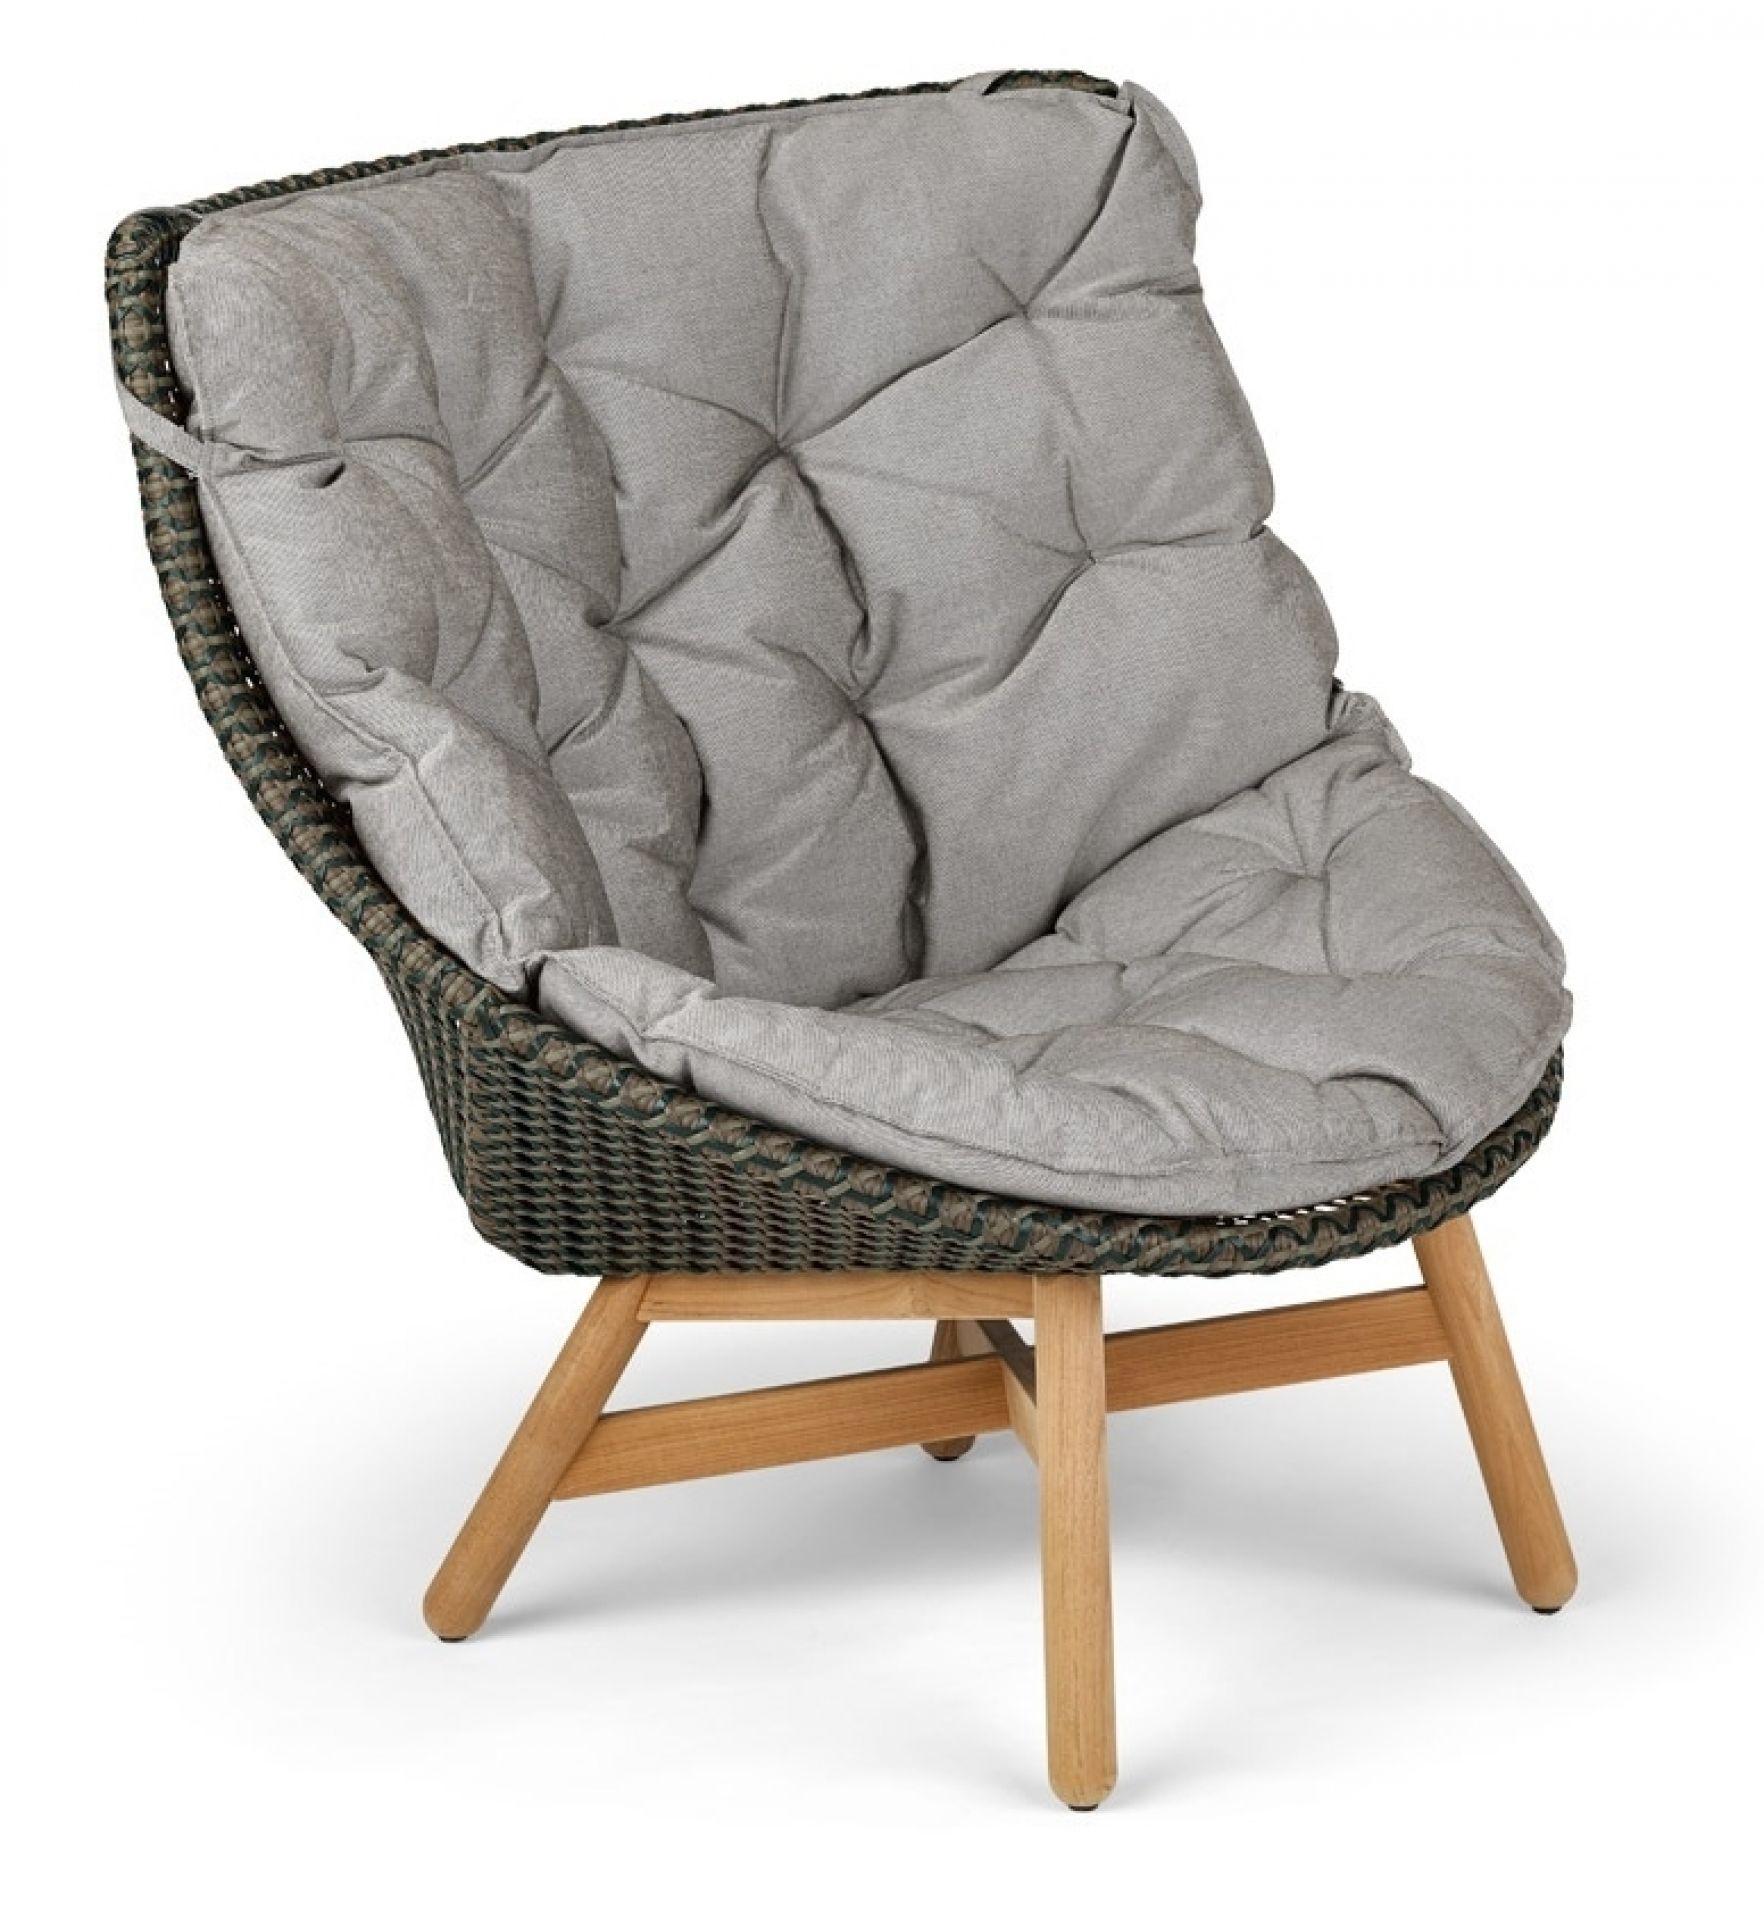 Mbrace wing chair Hochlehner pepper Dedon